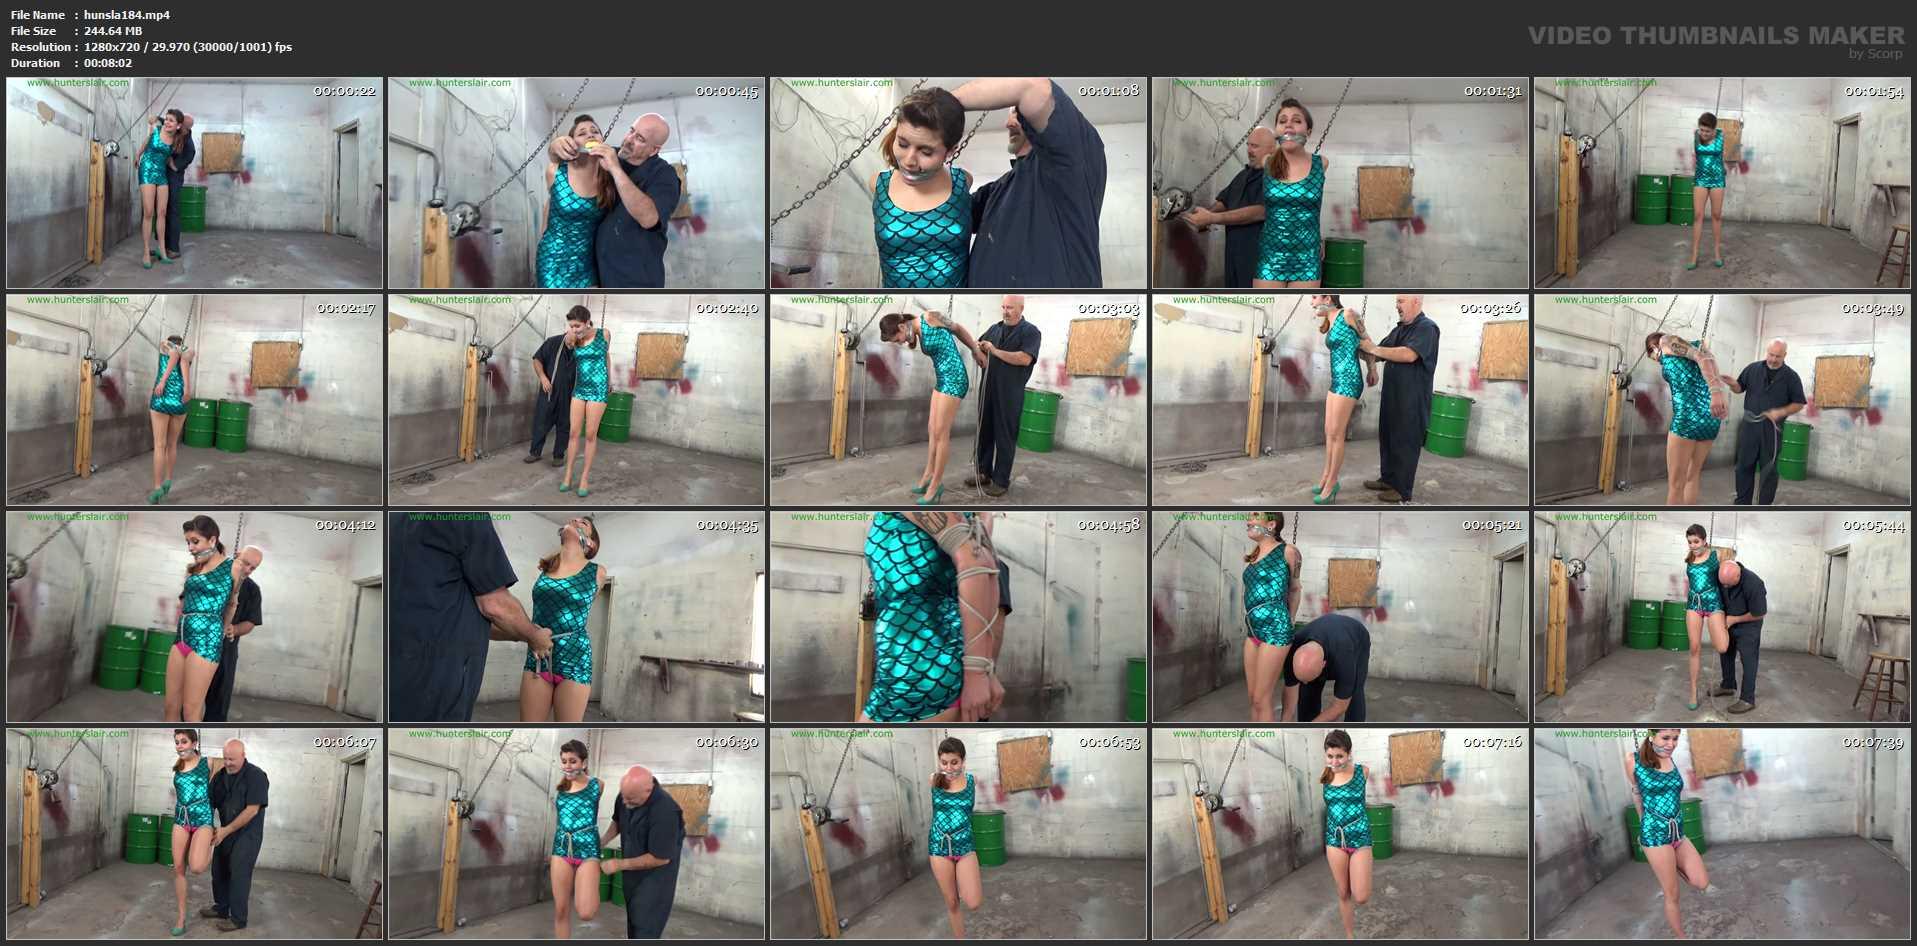 [HUNTERSLAIR] Flamingo crotch roped struggles. Featuring: Raquel Roper [HD][720p][MP4]